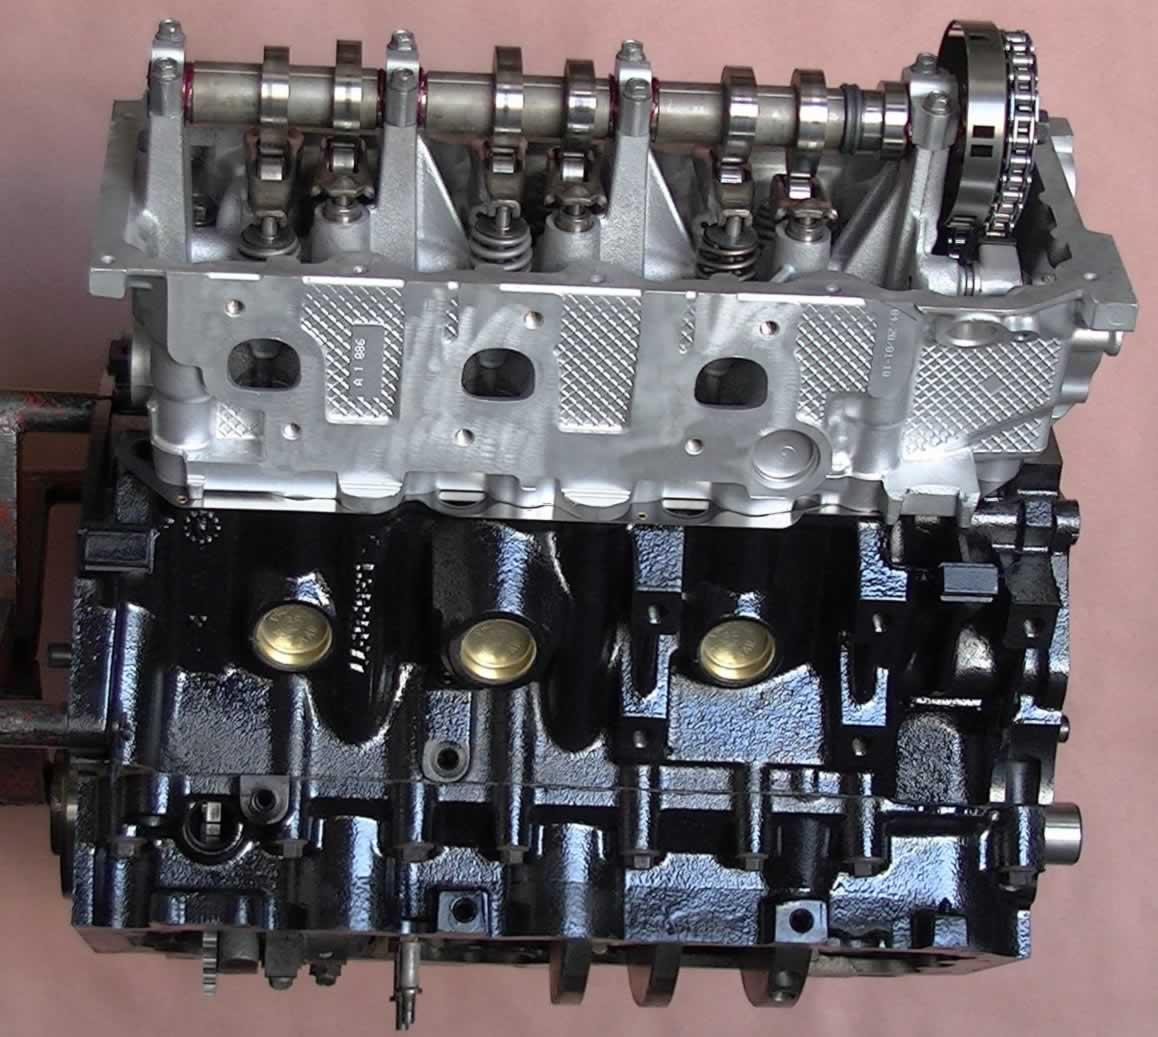 Rebuilt 2008 Jeep Grand Cherokee V6 3.7L Longblock Engine